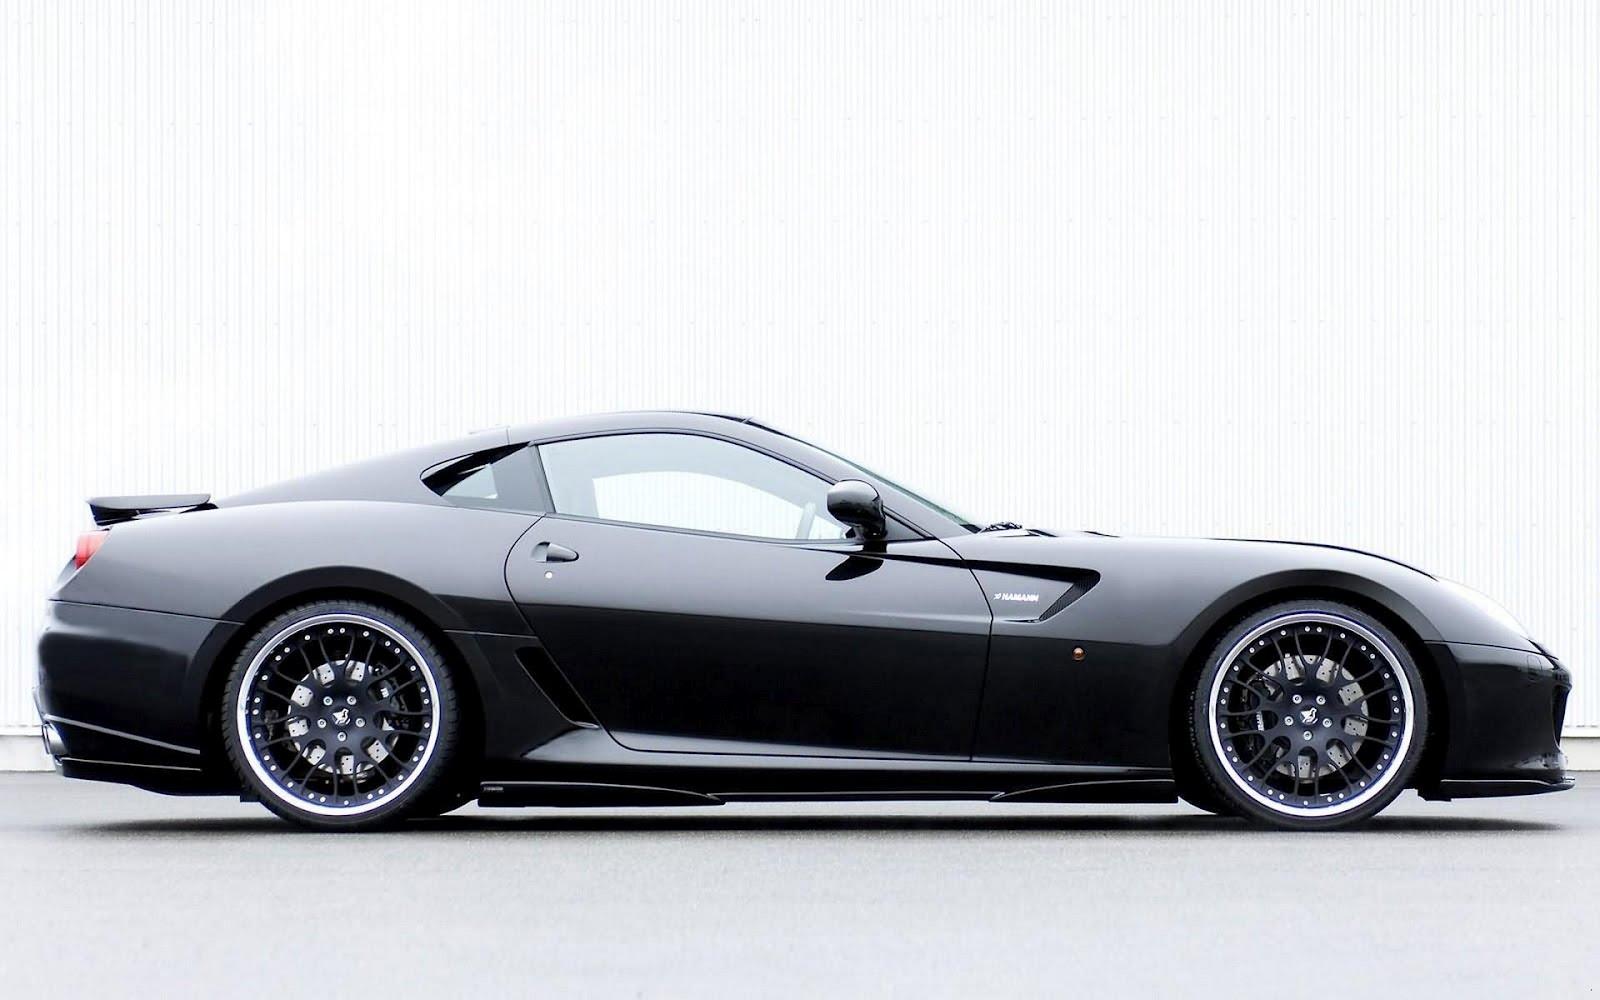 New Luxury Cars Wallpaers